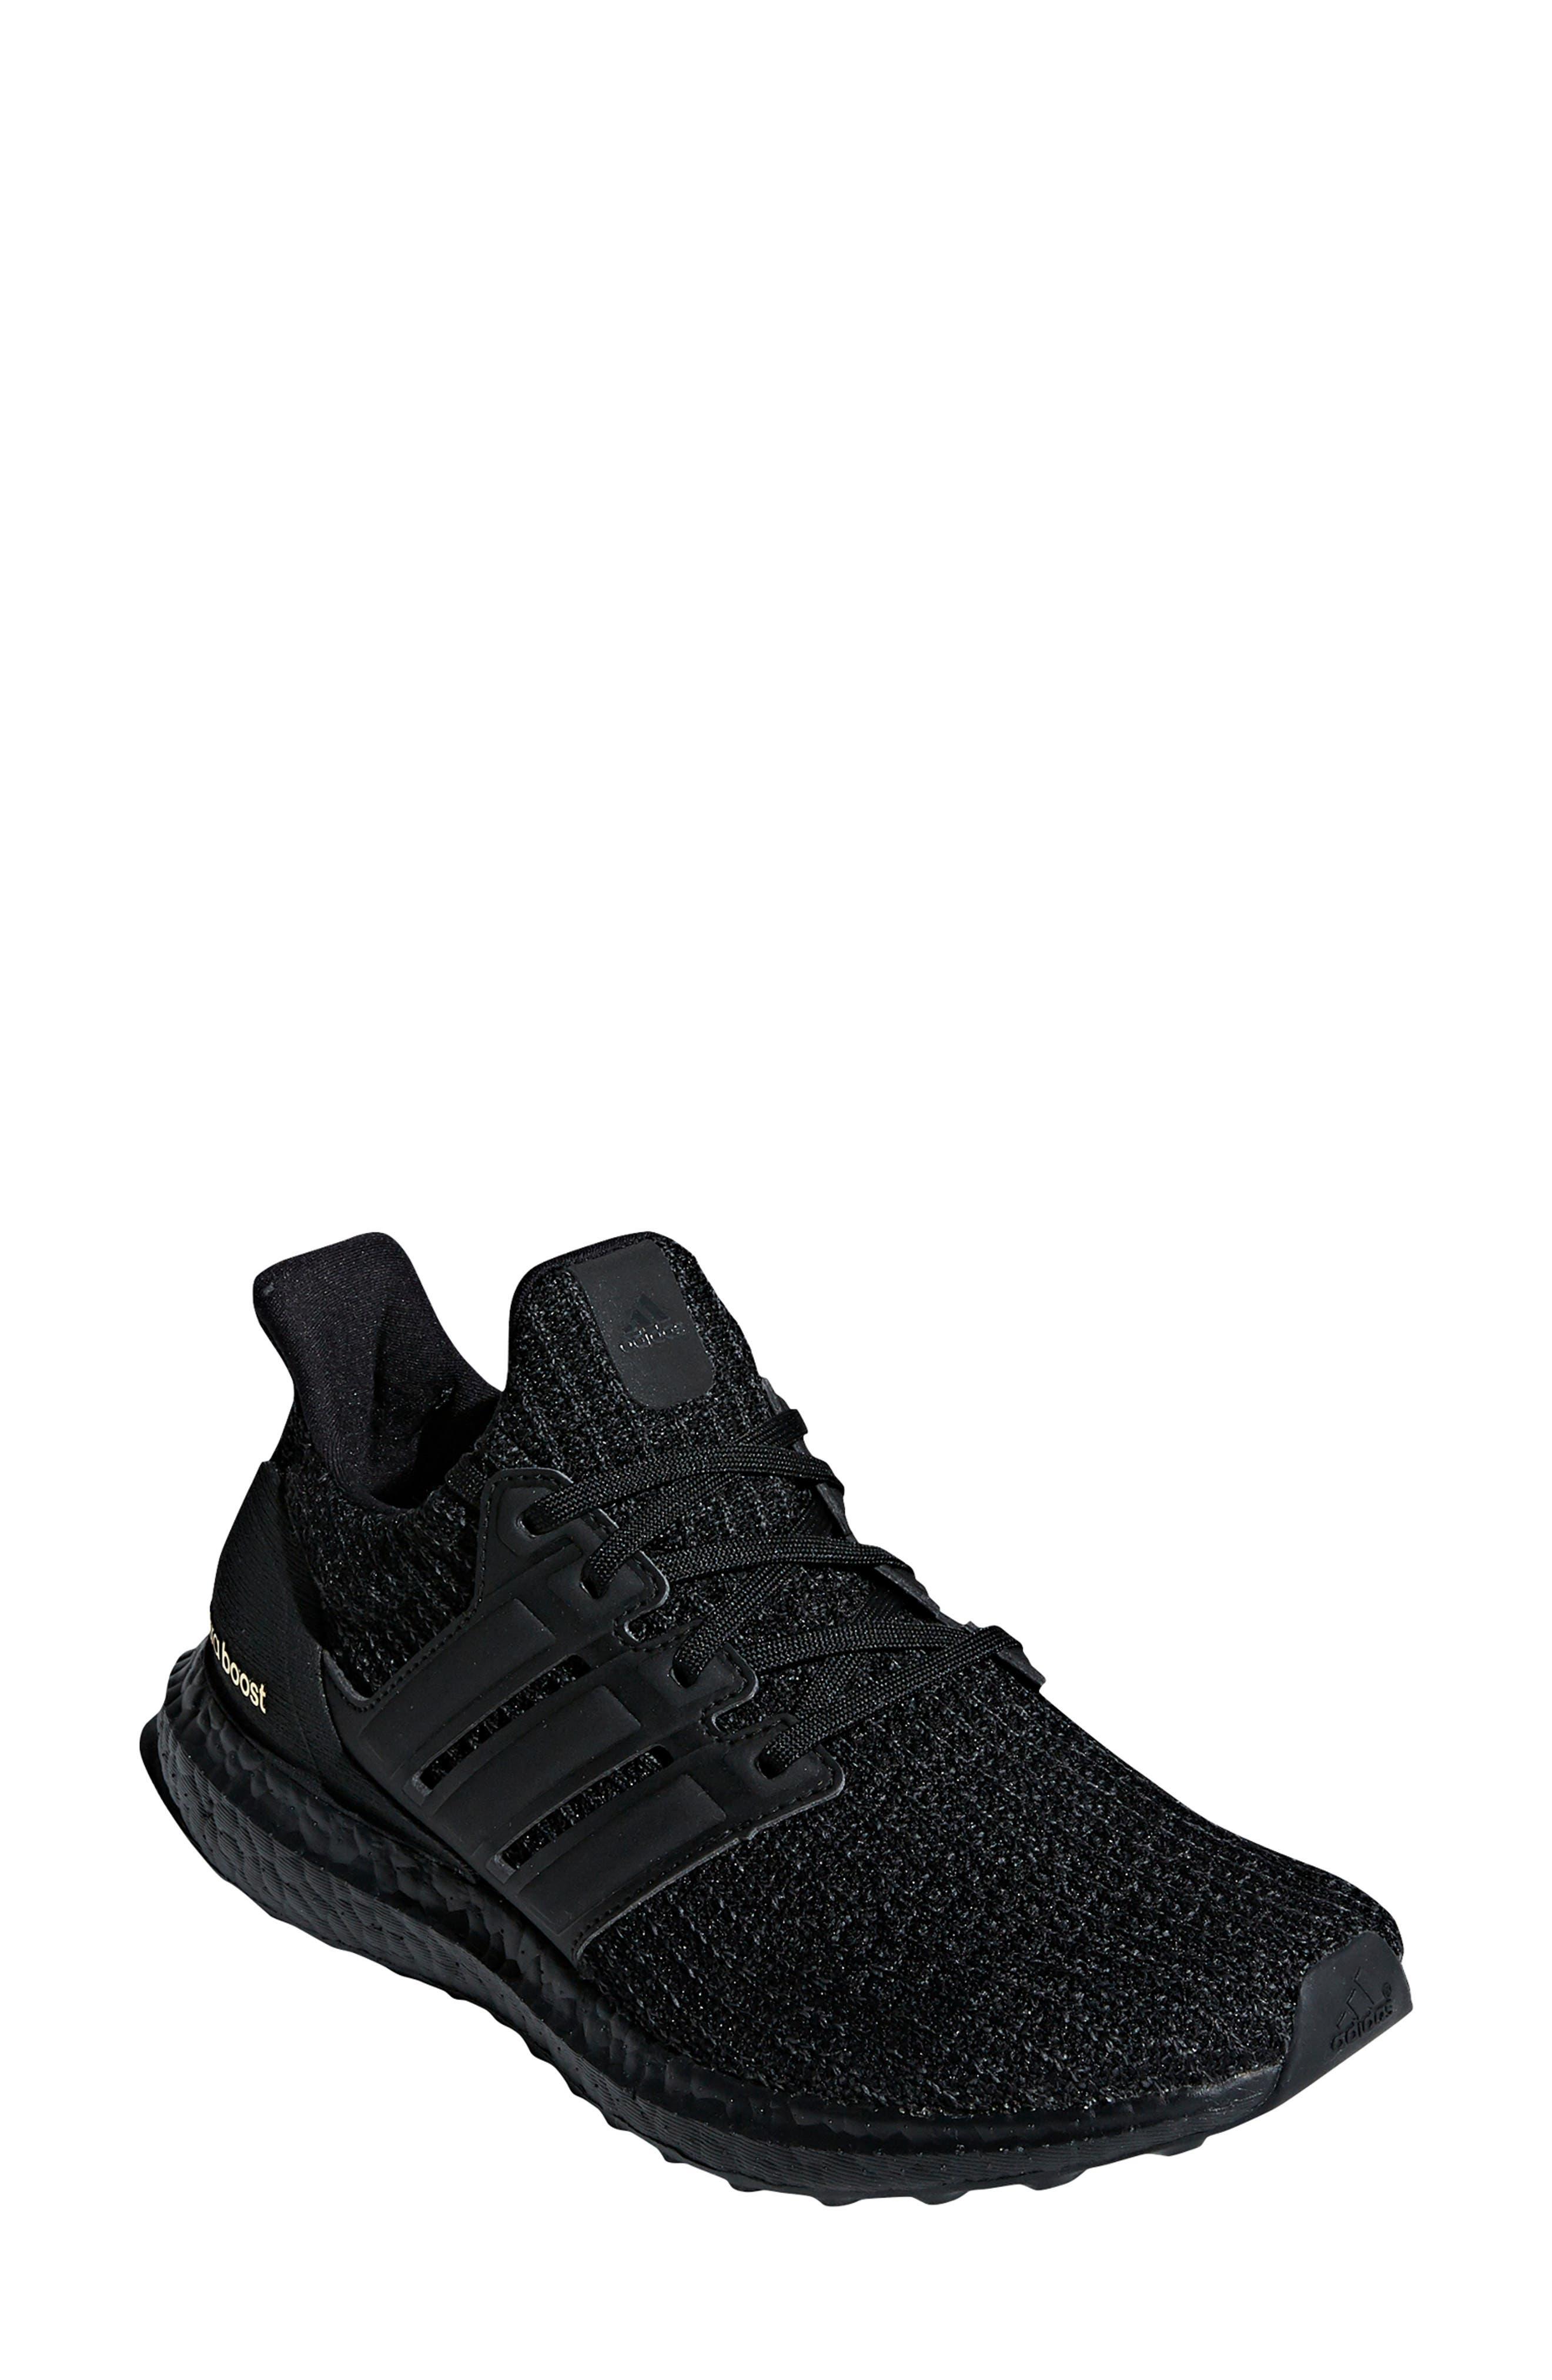 sale retailer 3d326 c08c5 Adidas Ultraboost Running Shoe, Black